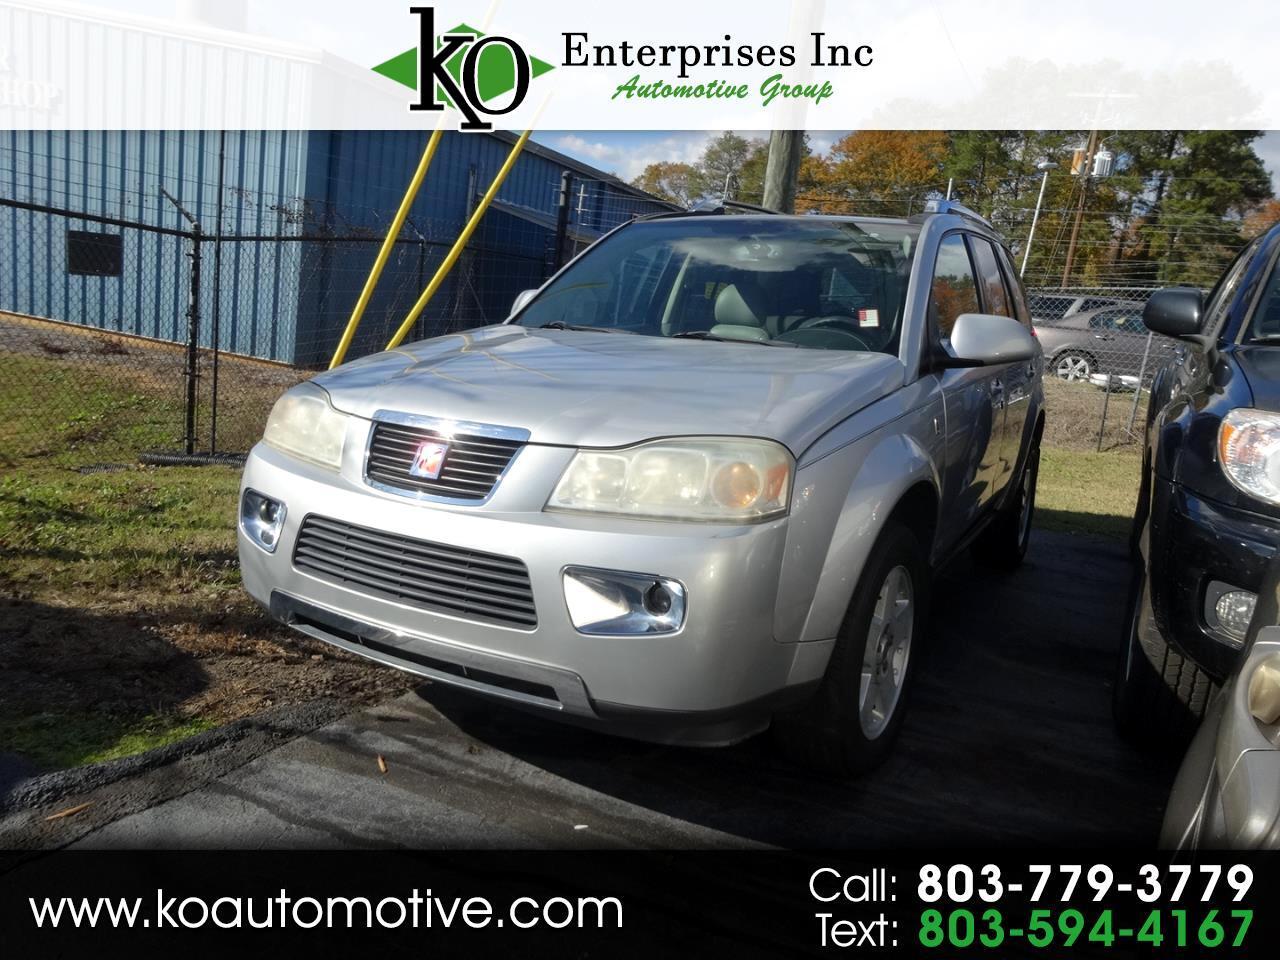 2007 Saturn VUE FWD 4dr V6 Auto